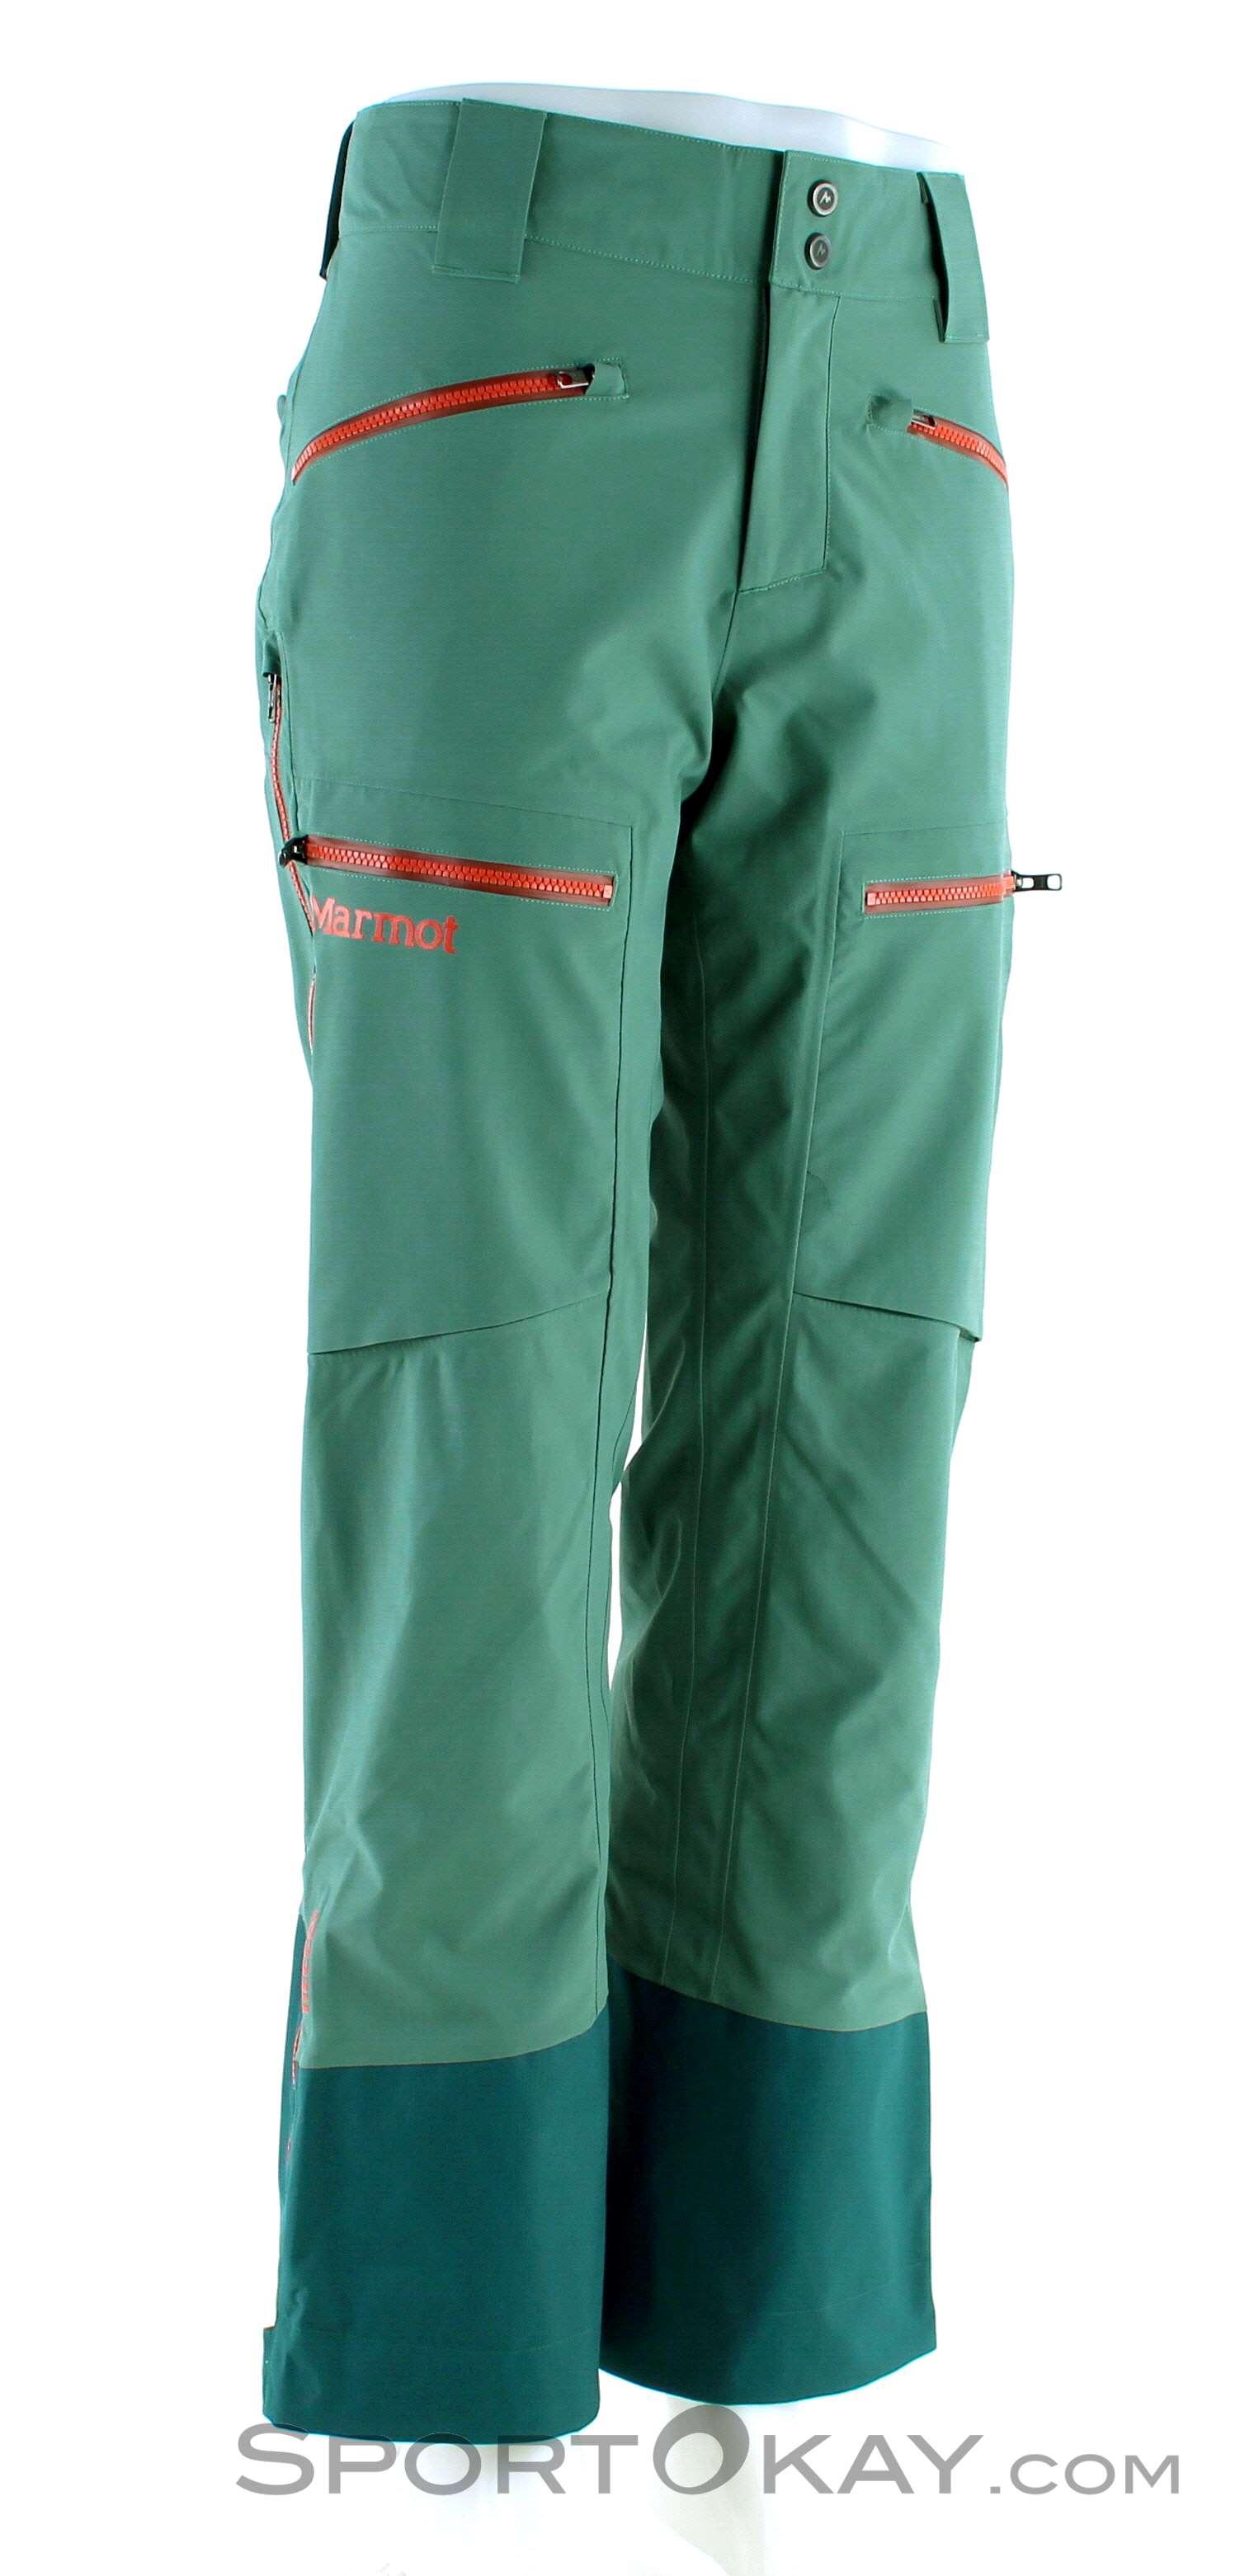 reputable site fd082 5613e Marmot Marmot Freeride Uomo Pantaloni da Sci Alpinismo